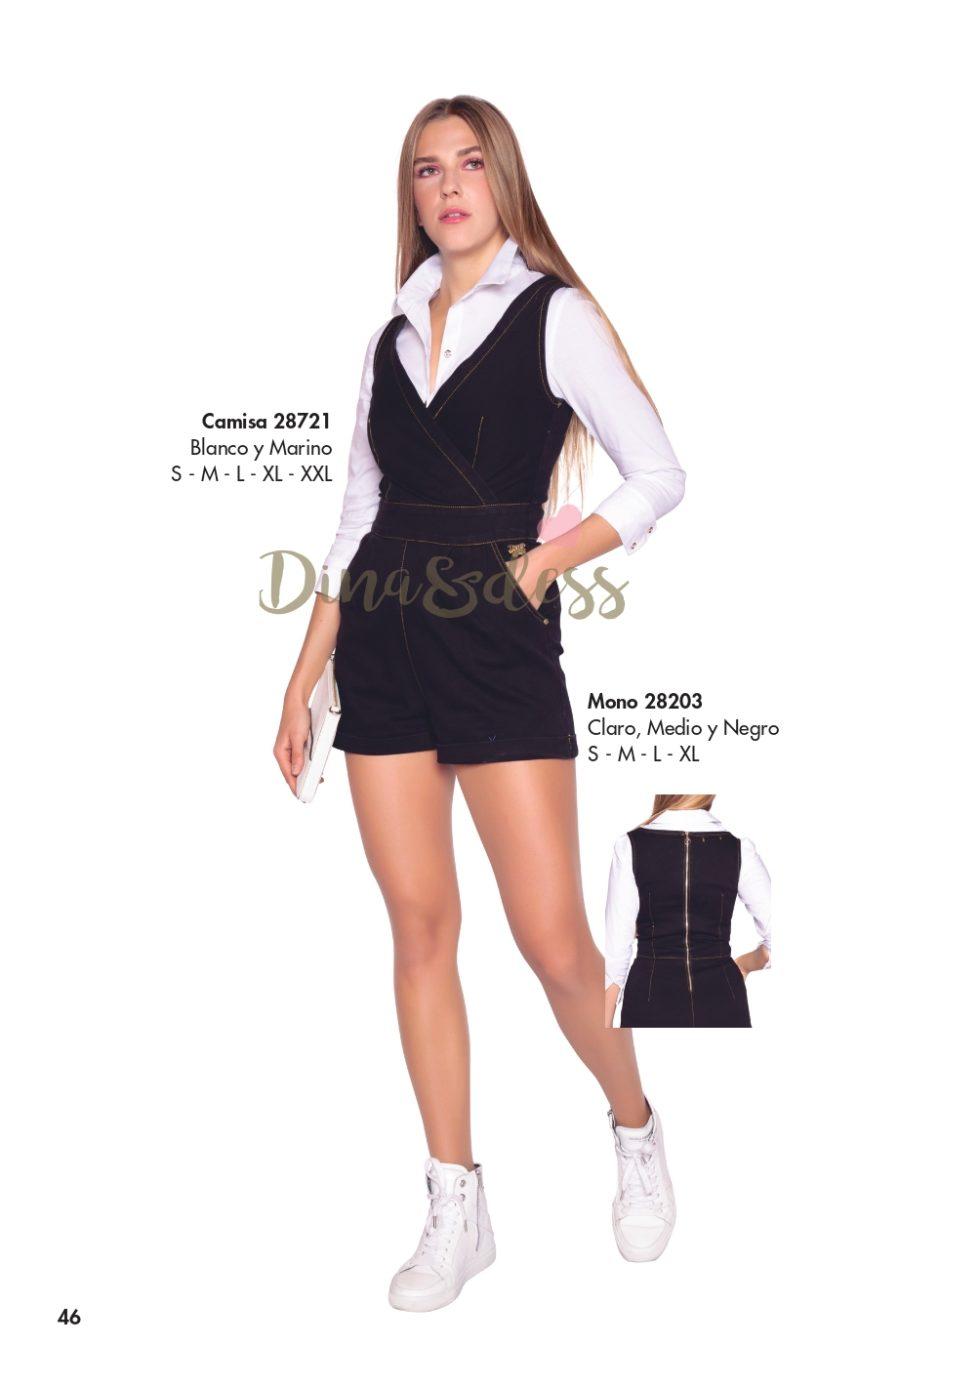 Verano 2021 Dina&Dess Clientes_page-0048